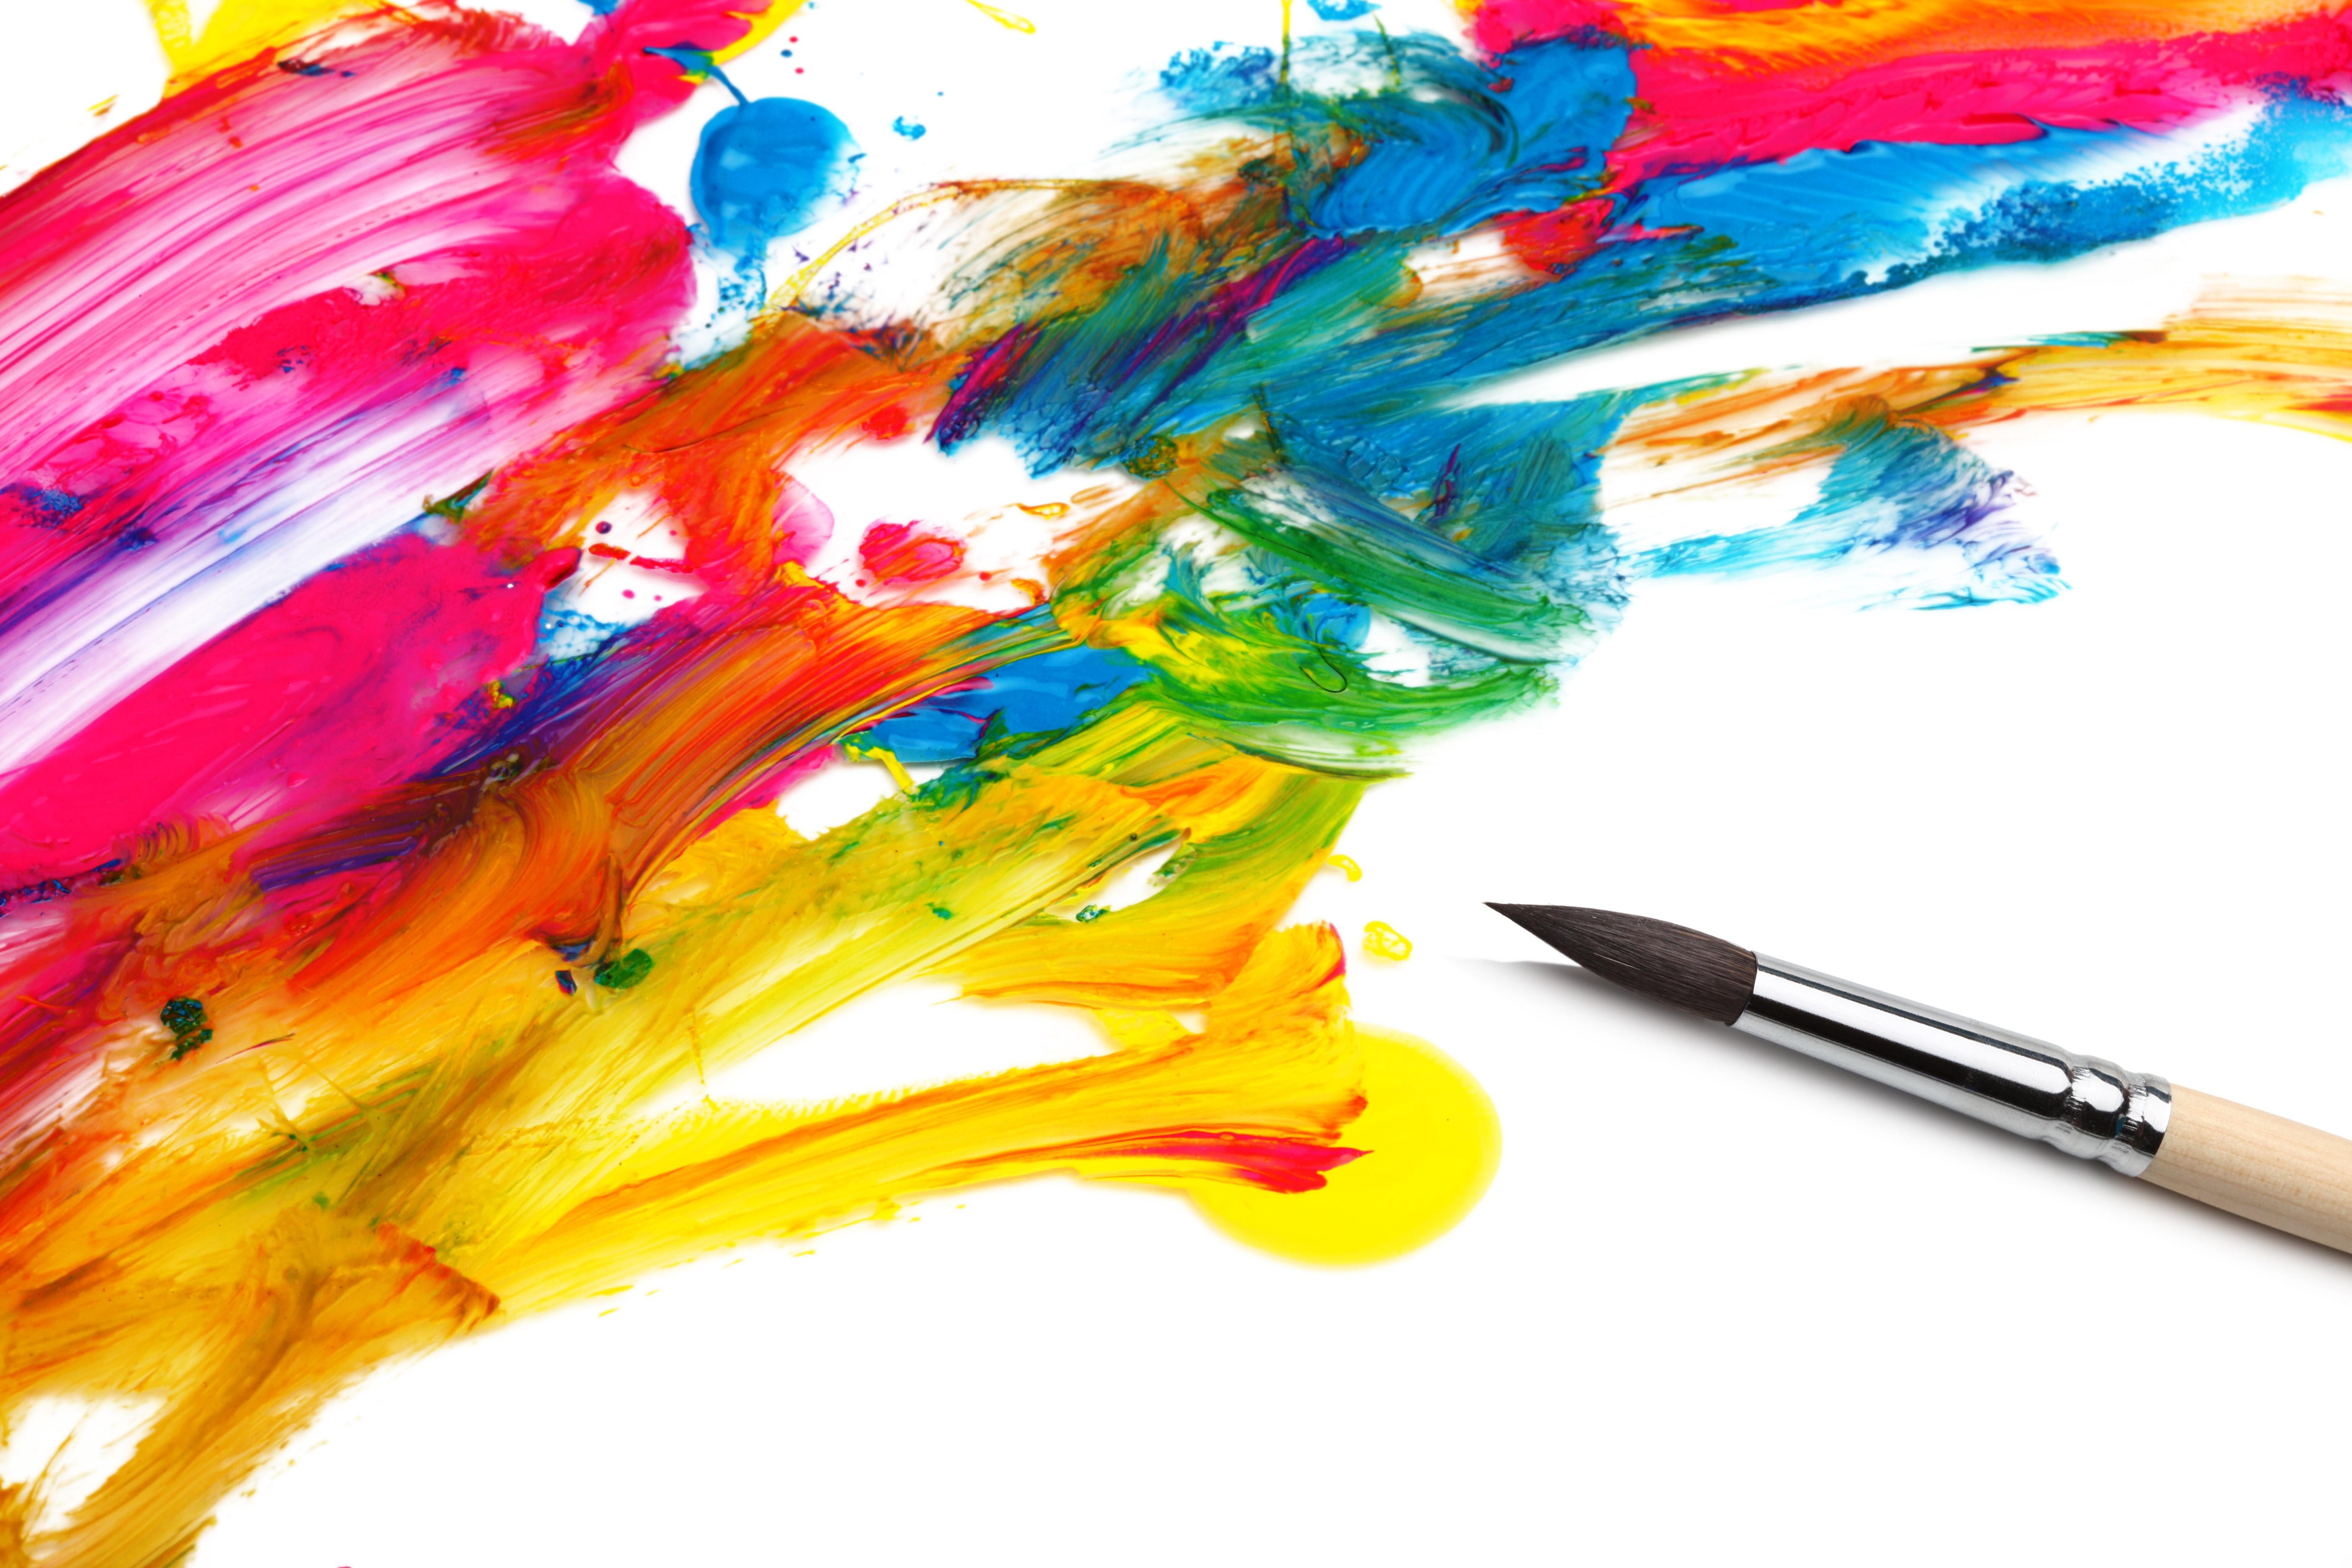 [48+] Paint Brush Wallpaper on WallpaperSafari